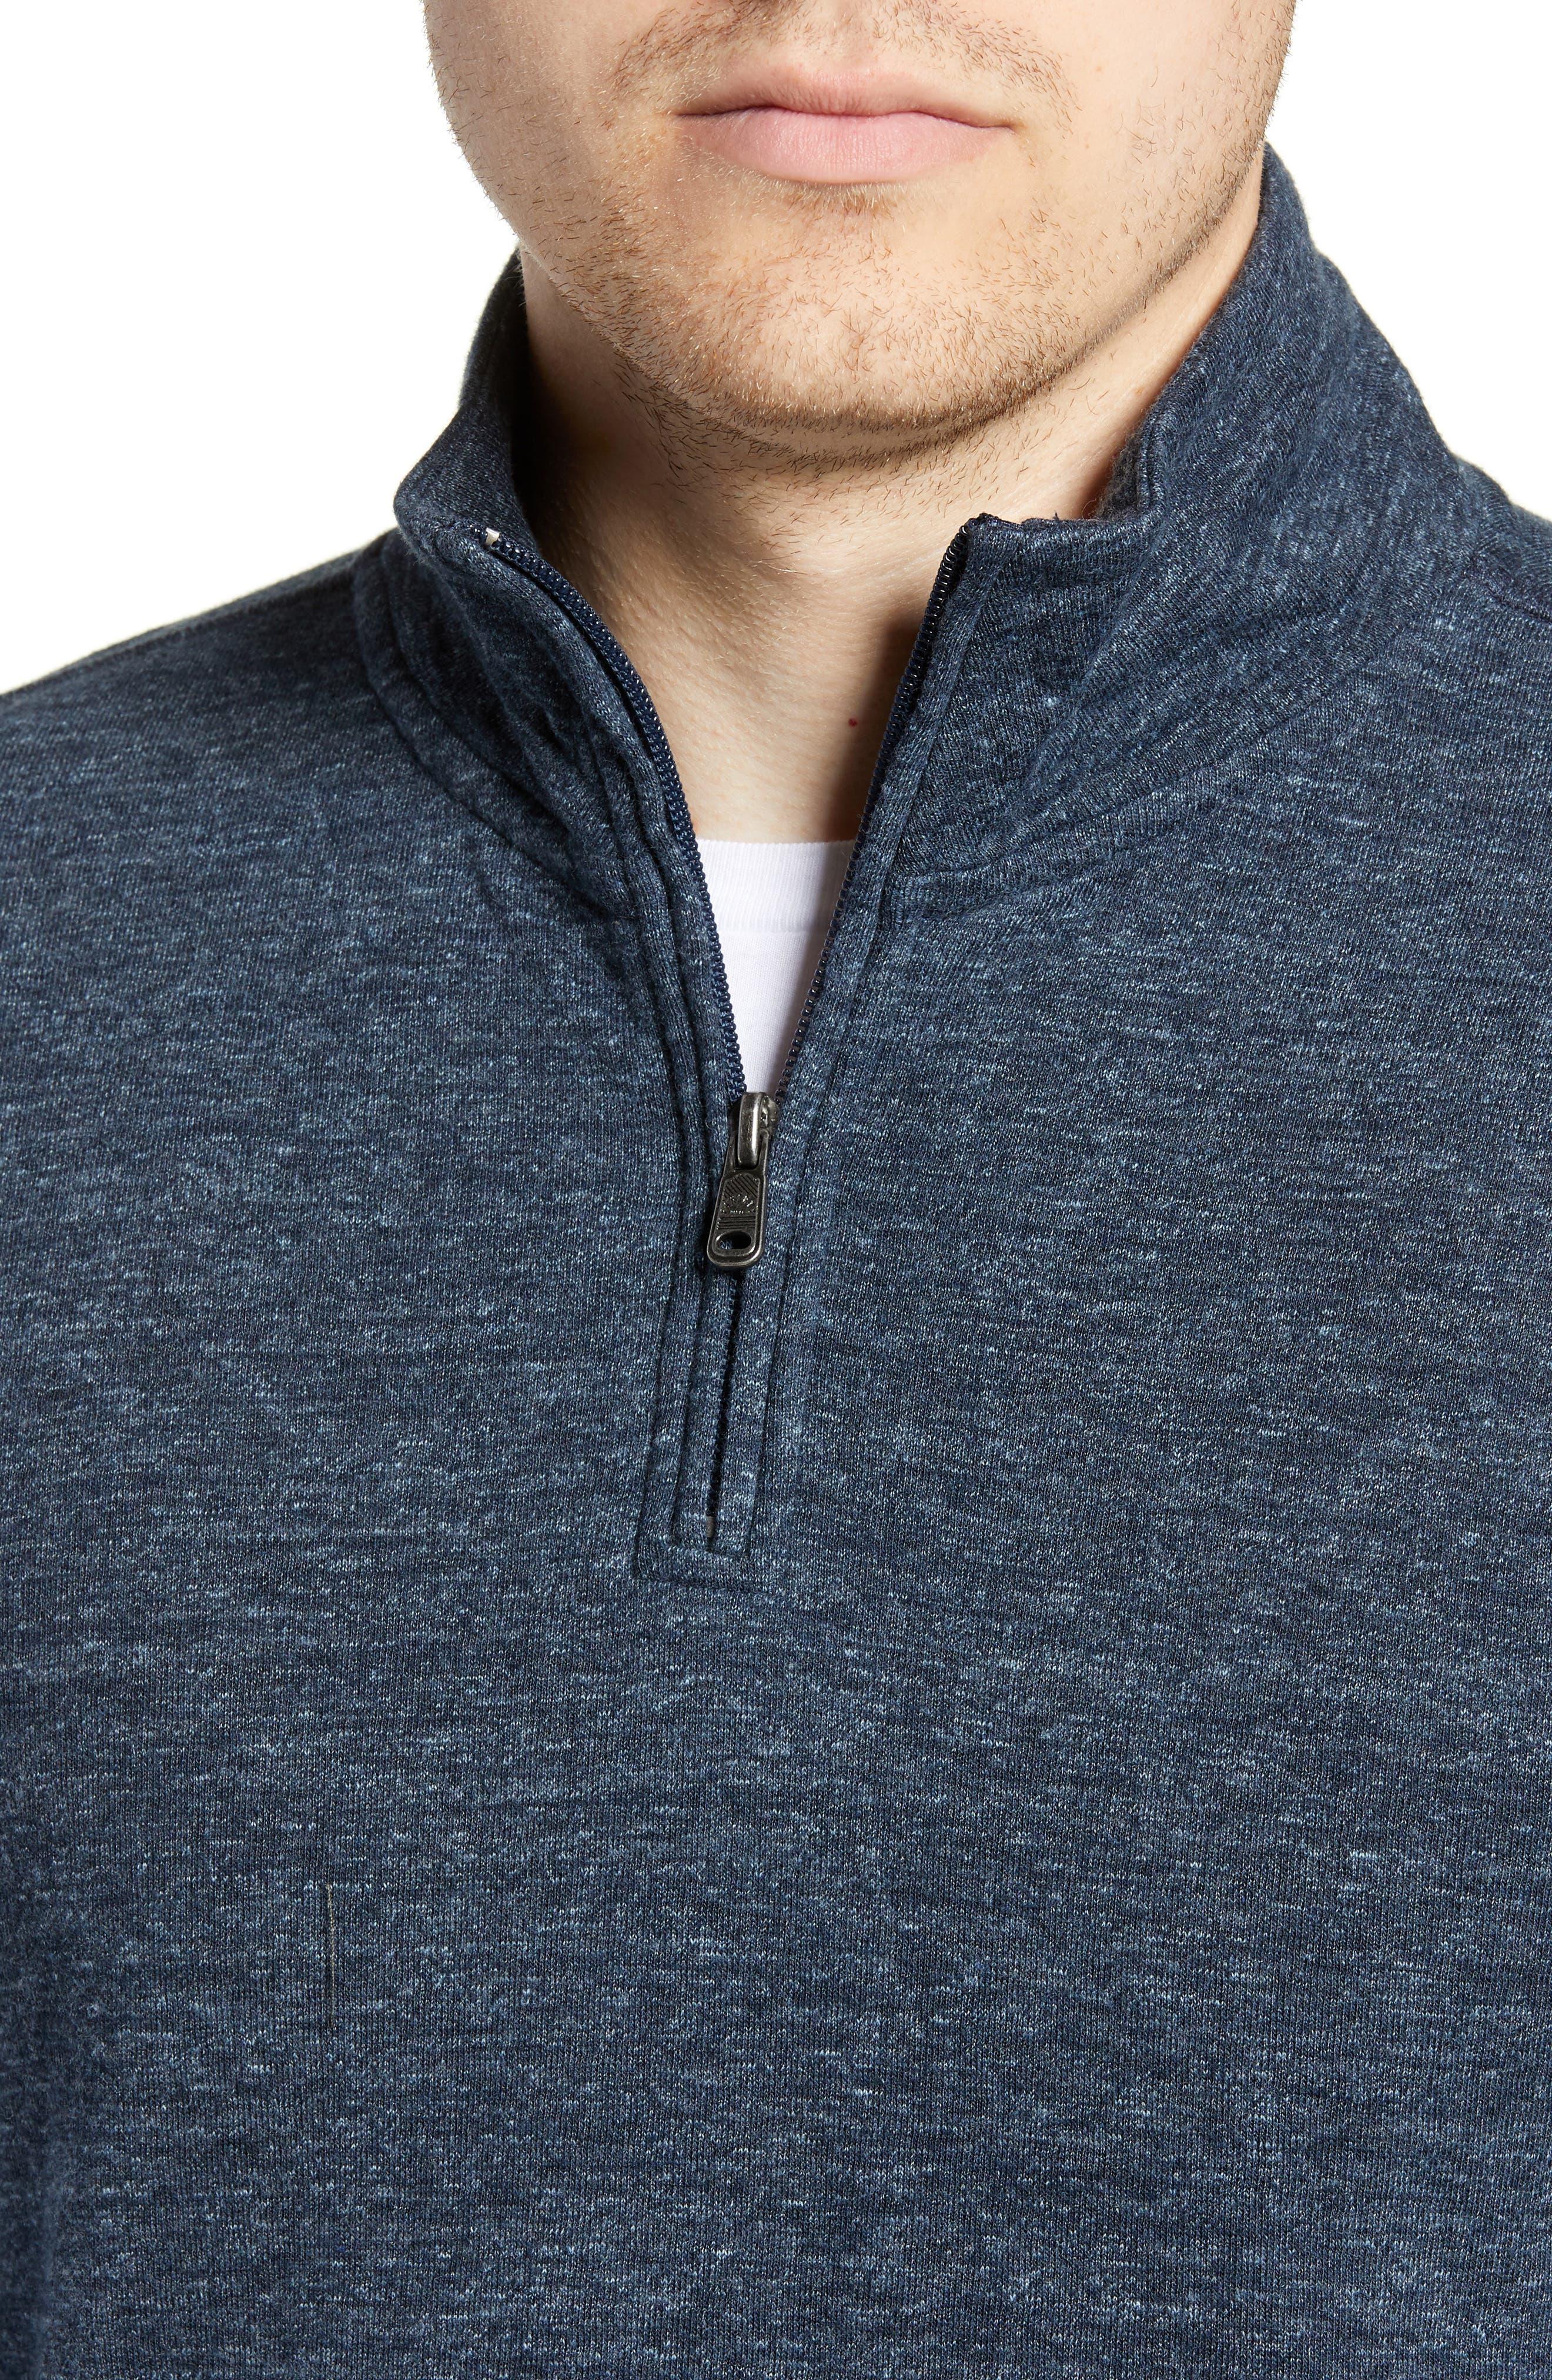 Brand Dual Knit Regular Fit Quarter Zip Pullover,                             Alternate thumbnail 4, color,                             NAVY